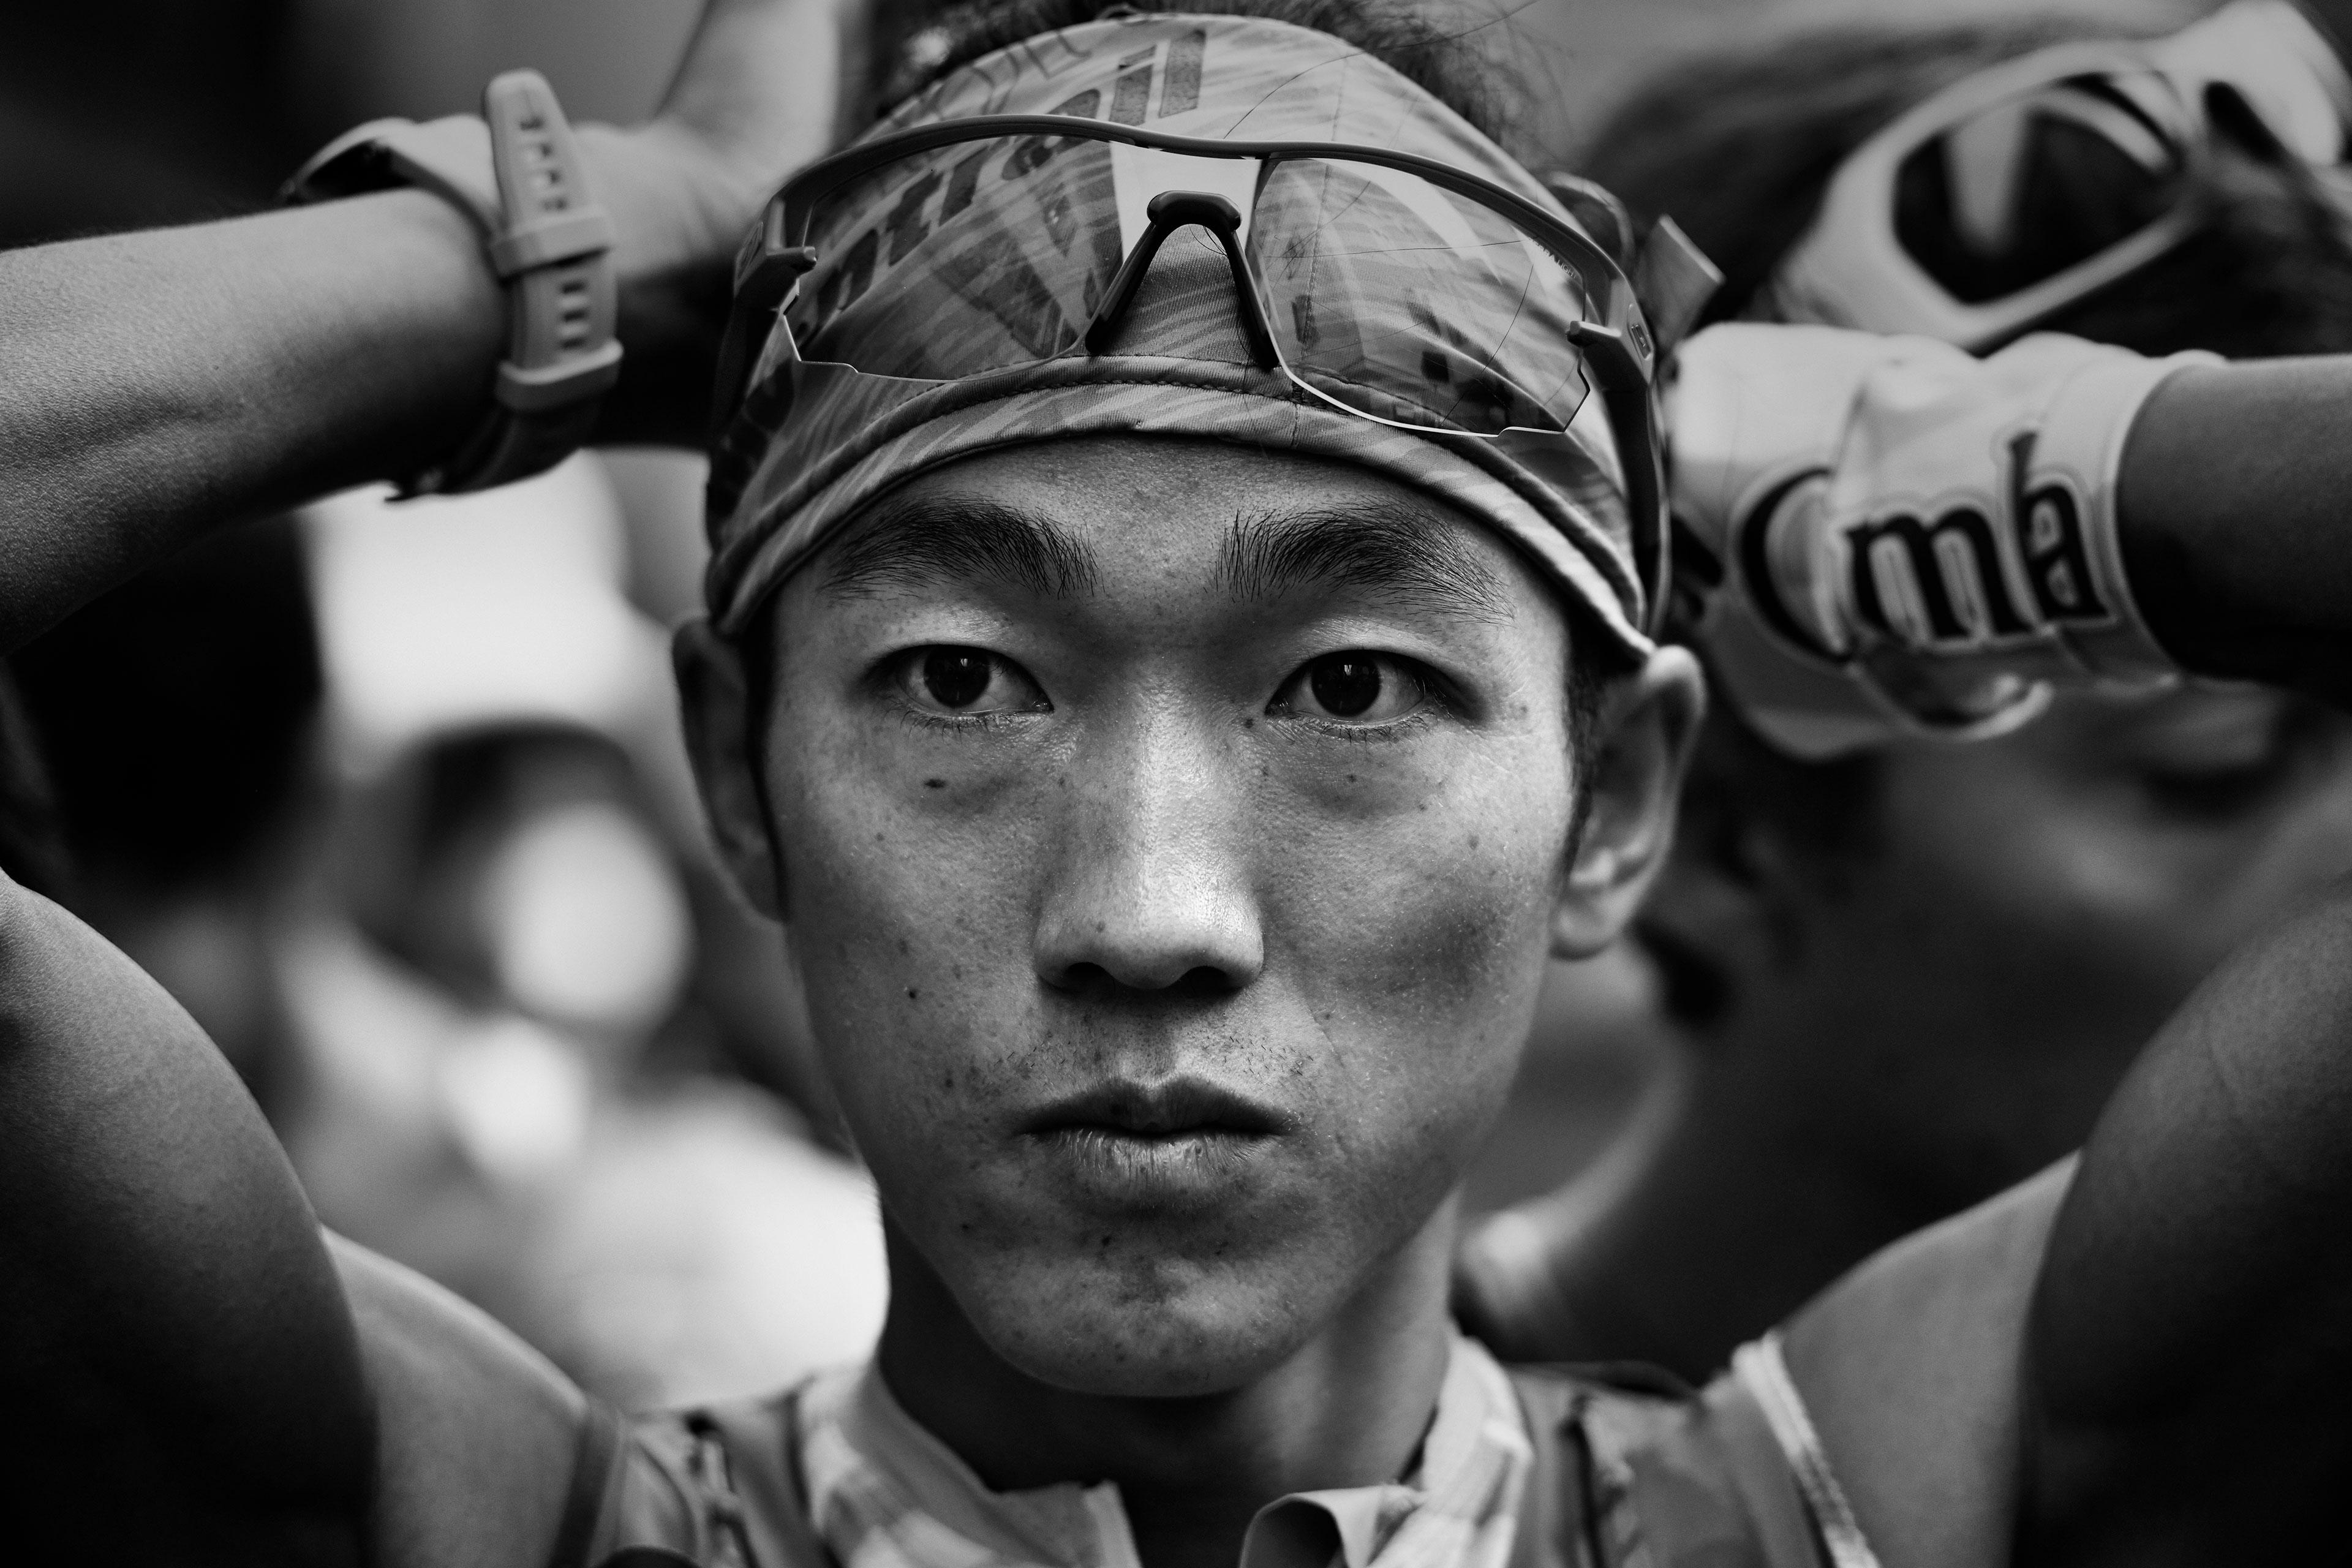 Shen Jiasheng / OCC Ultra Trail du Mont Blanc 2018